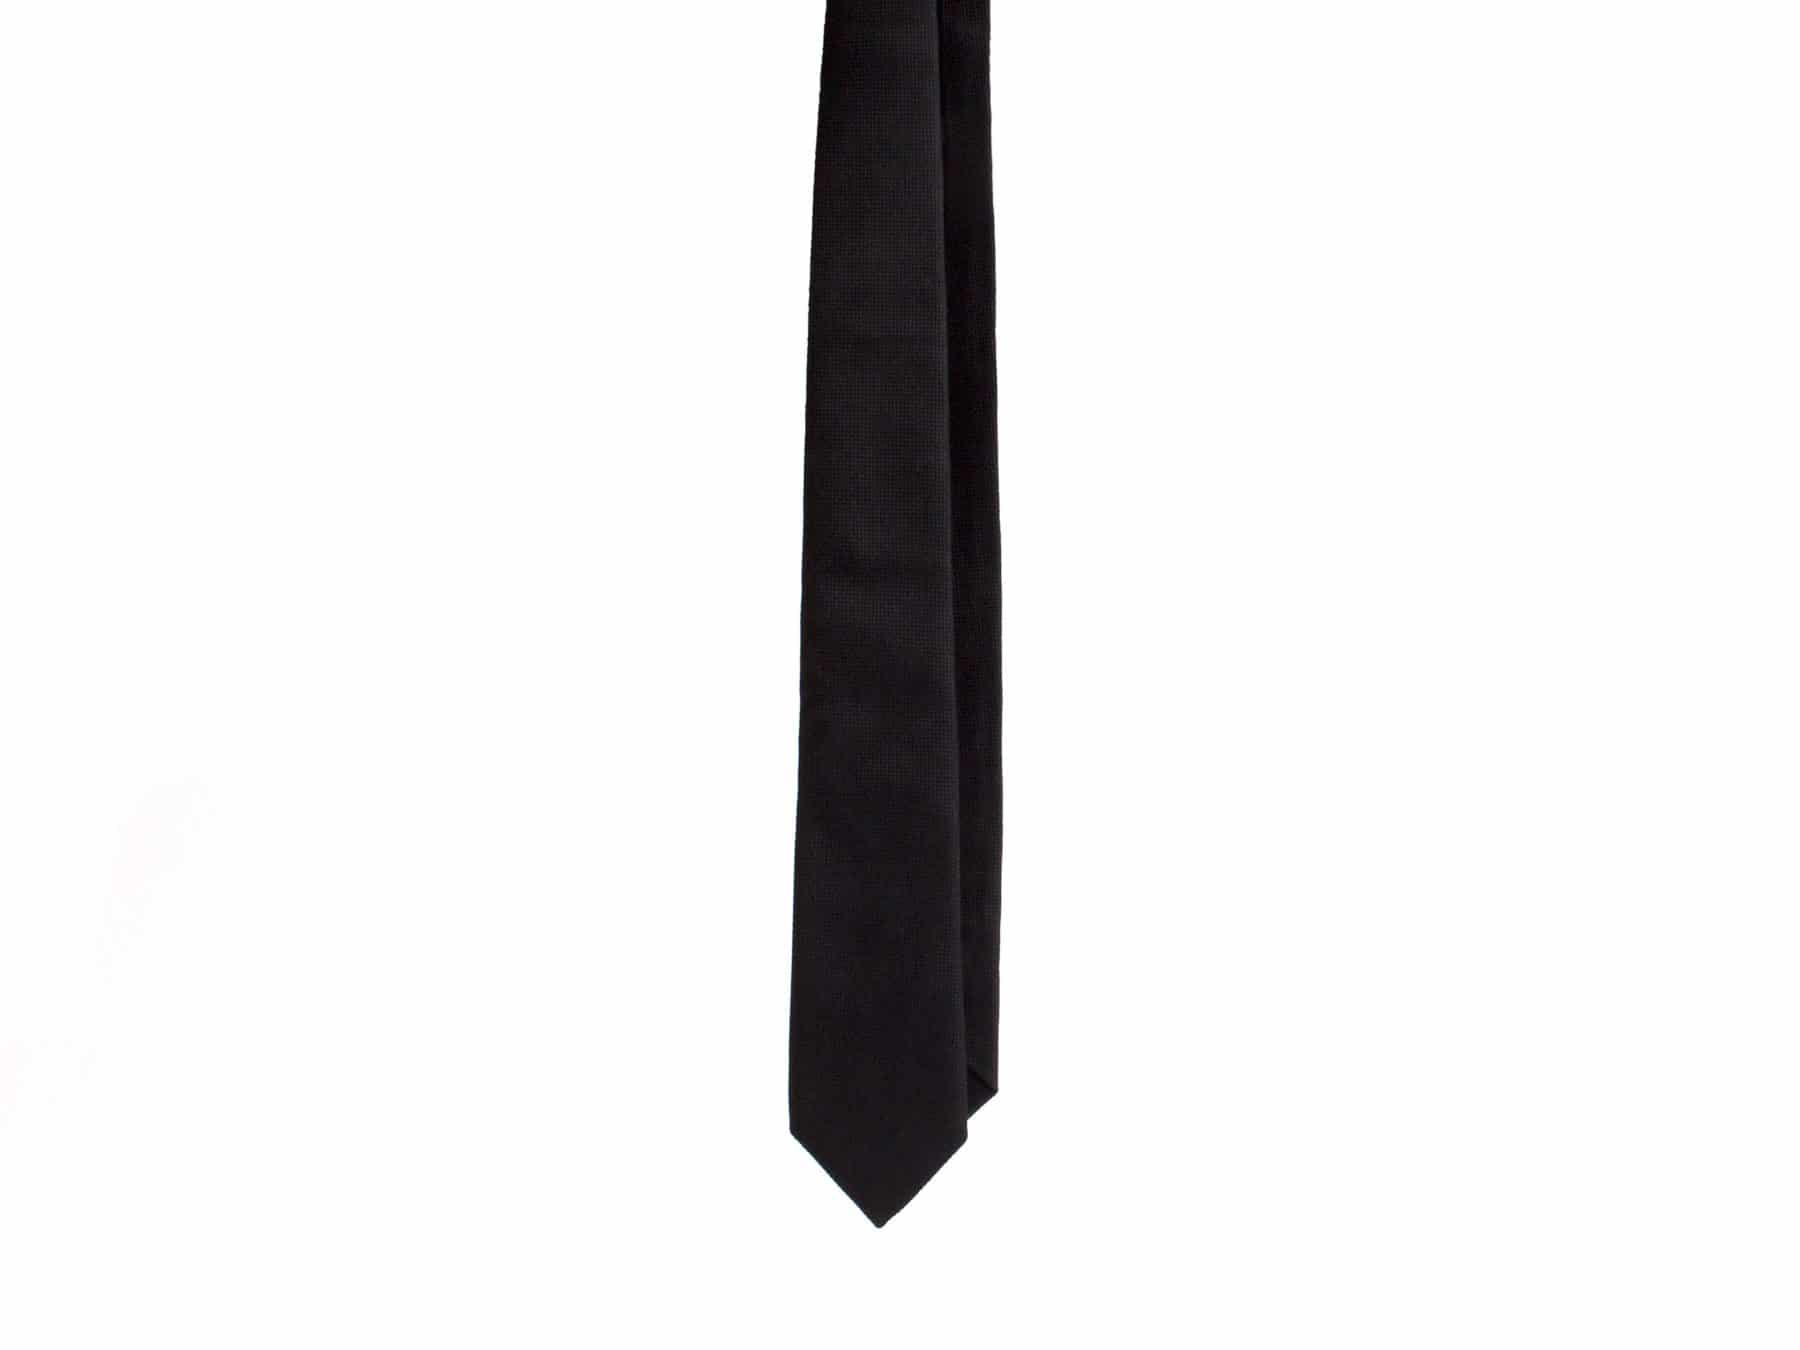 Seidenkrawatte Carpasus Krawatte Schwarz Seide KURTS.chCarpasus Krawatte Schwarz Seide KURTS.ch